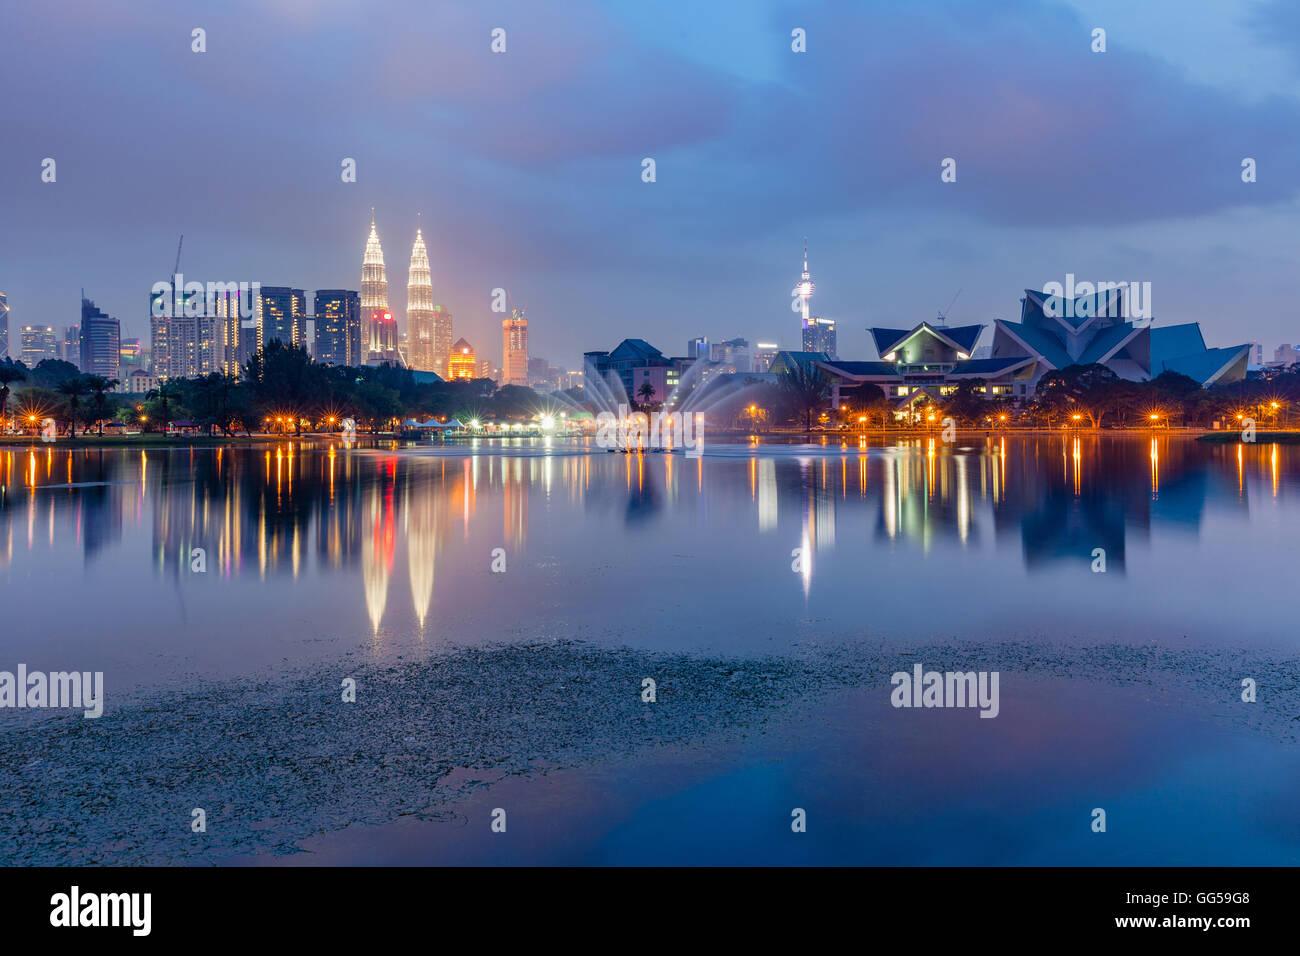 Kuala Lumpur skyline at dusk as seen from Titiwangsa Lakes, Kuala Lumpur, Malaysia - Stock Image